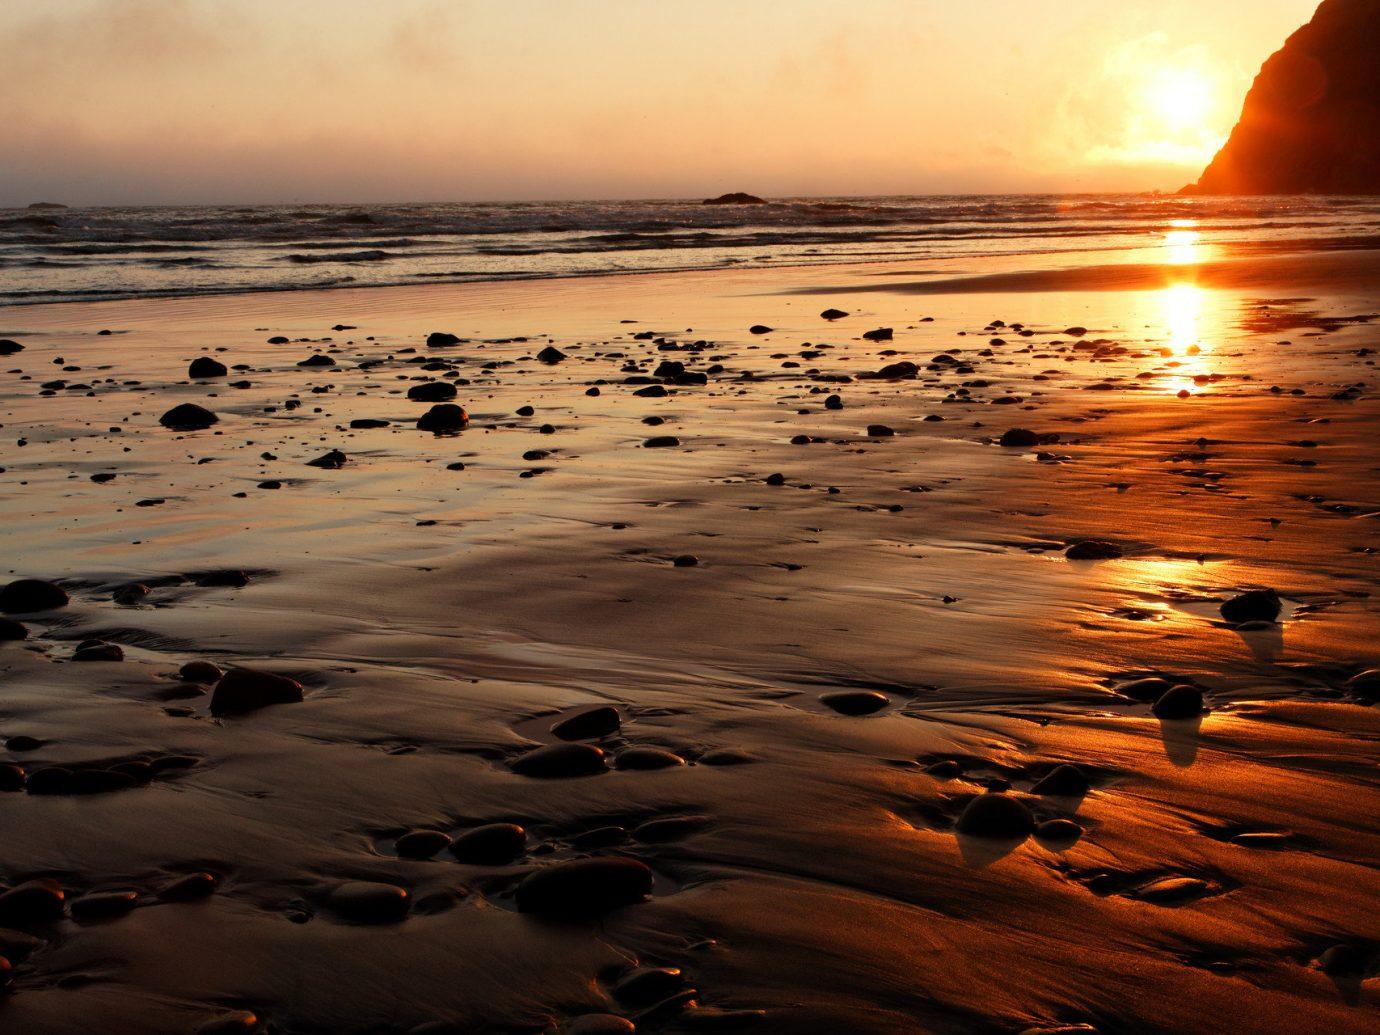 Trip Ideas outdoor sky Sunset Sun Beach reflection Nature shore Sea Coast horizon Ocean sunrise body of water dawn wave cloud morning rock evening sunlight sand dusk wind wave material sandy